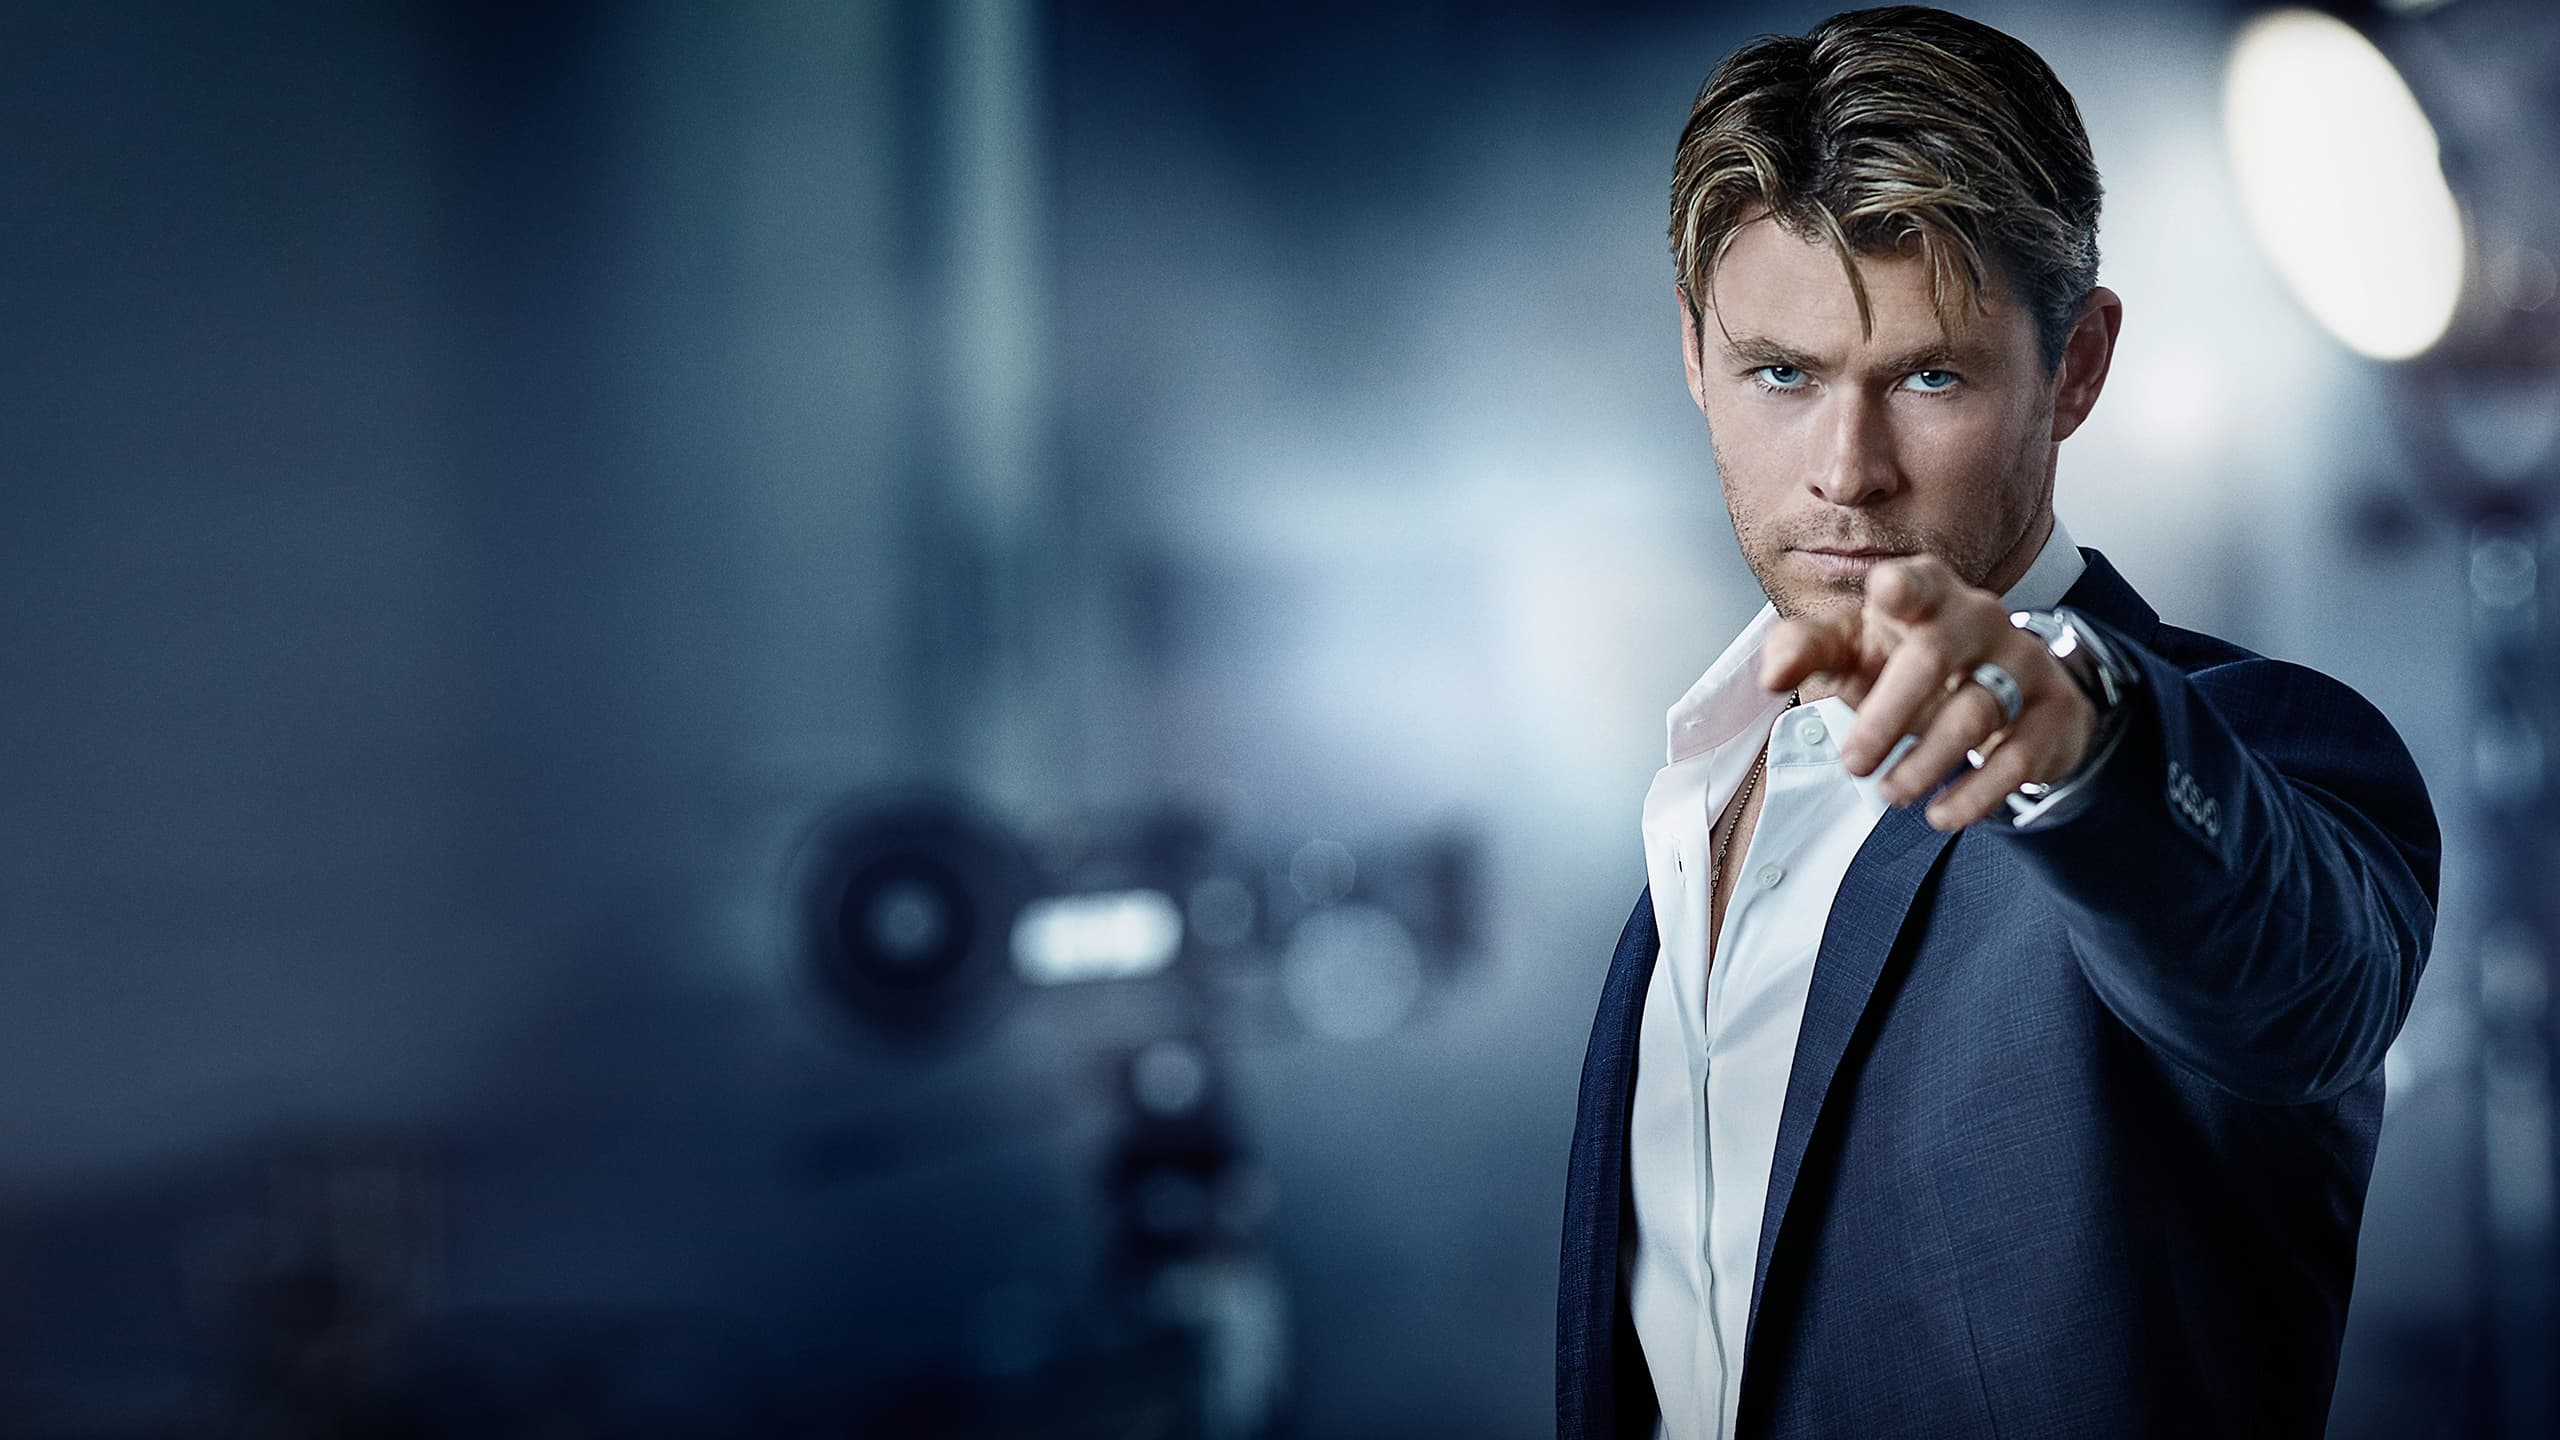 23 Chris Hemsworth wallpapers High Quality Resolution 2560x1440